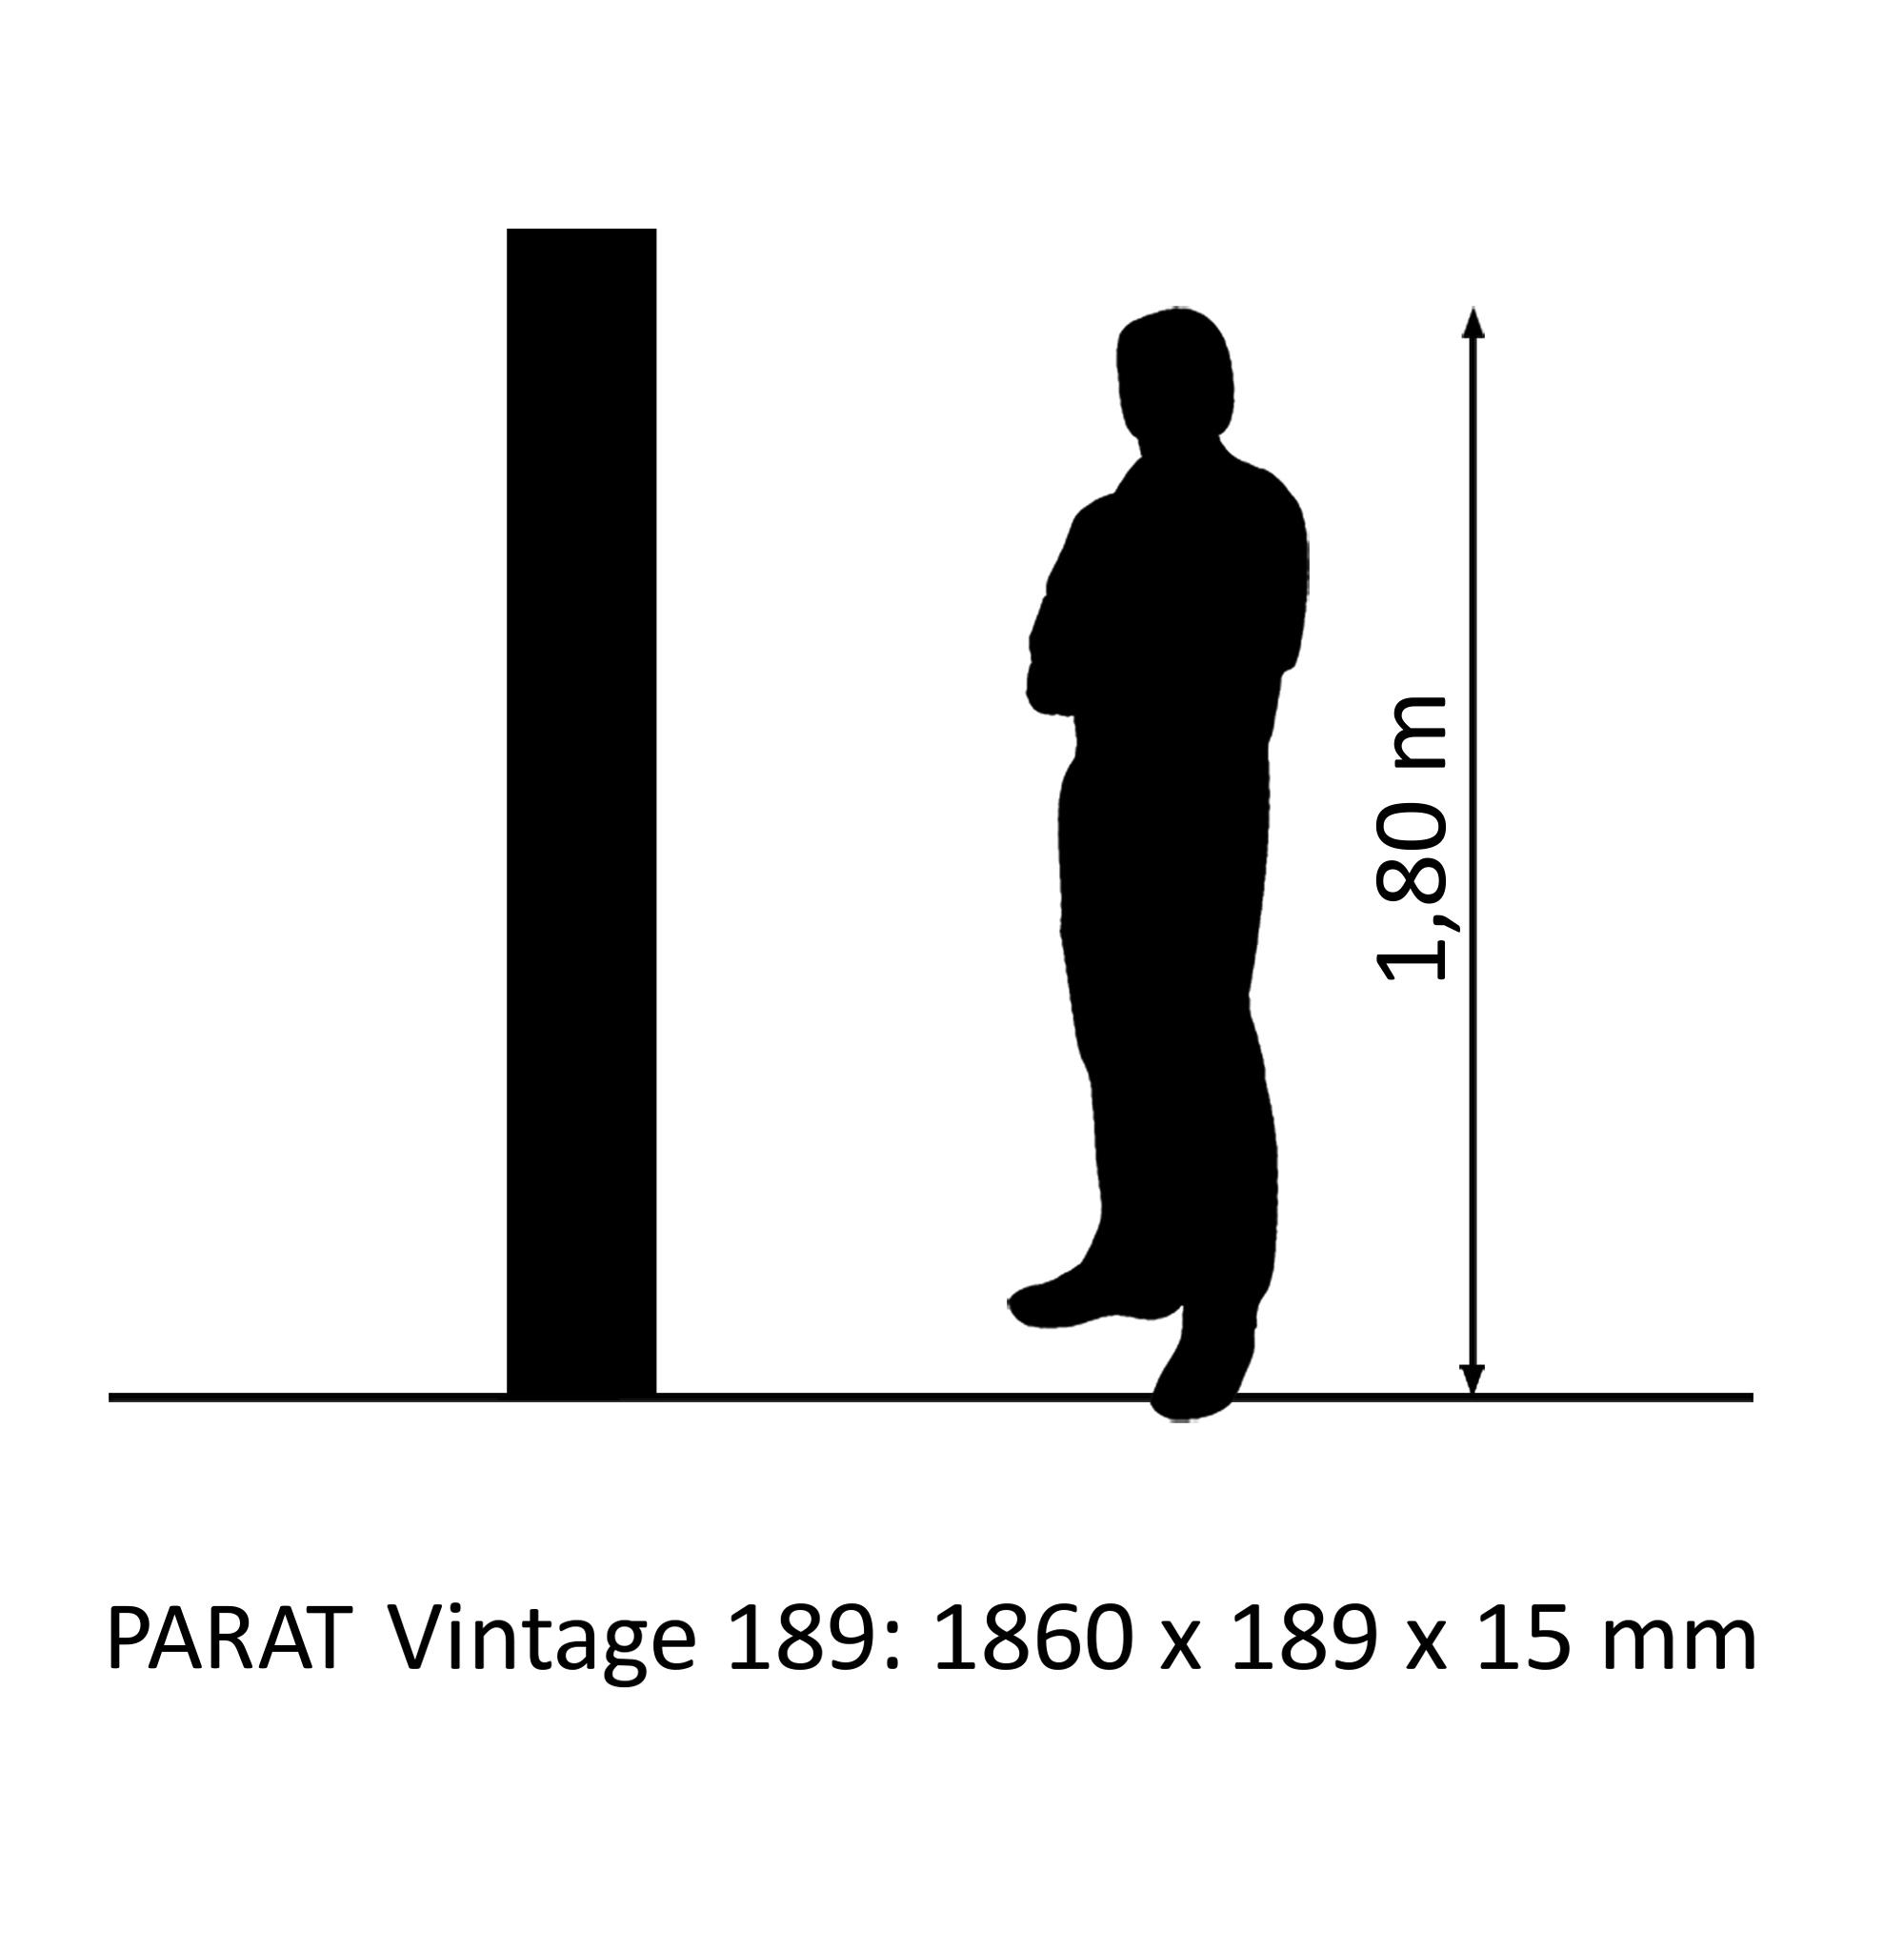 PARAT Vintage 189 wideplank oak